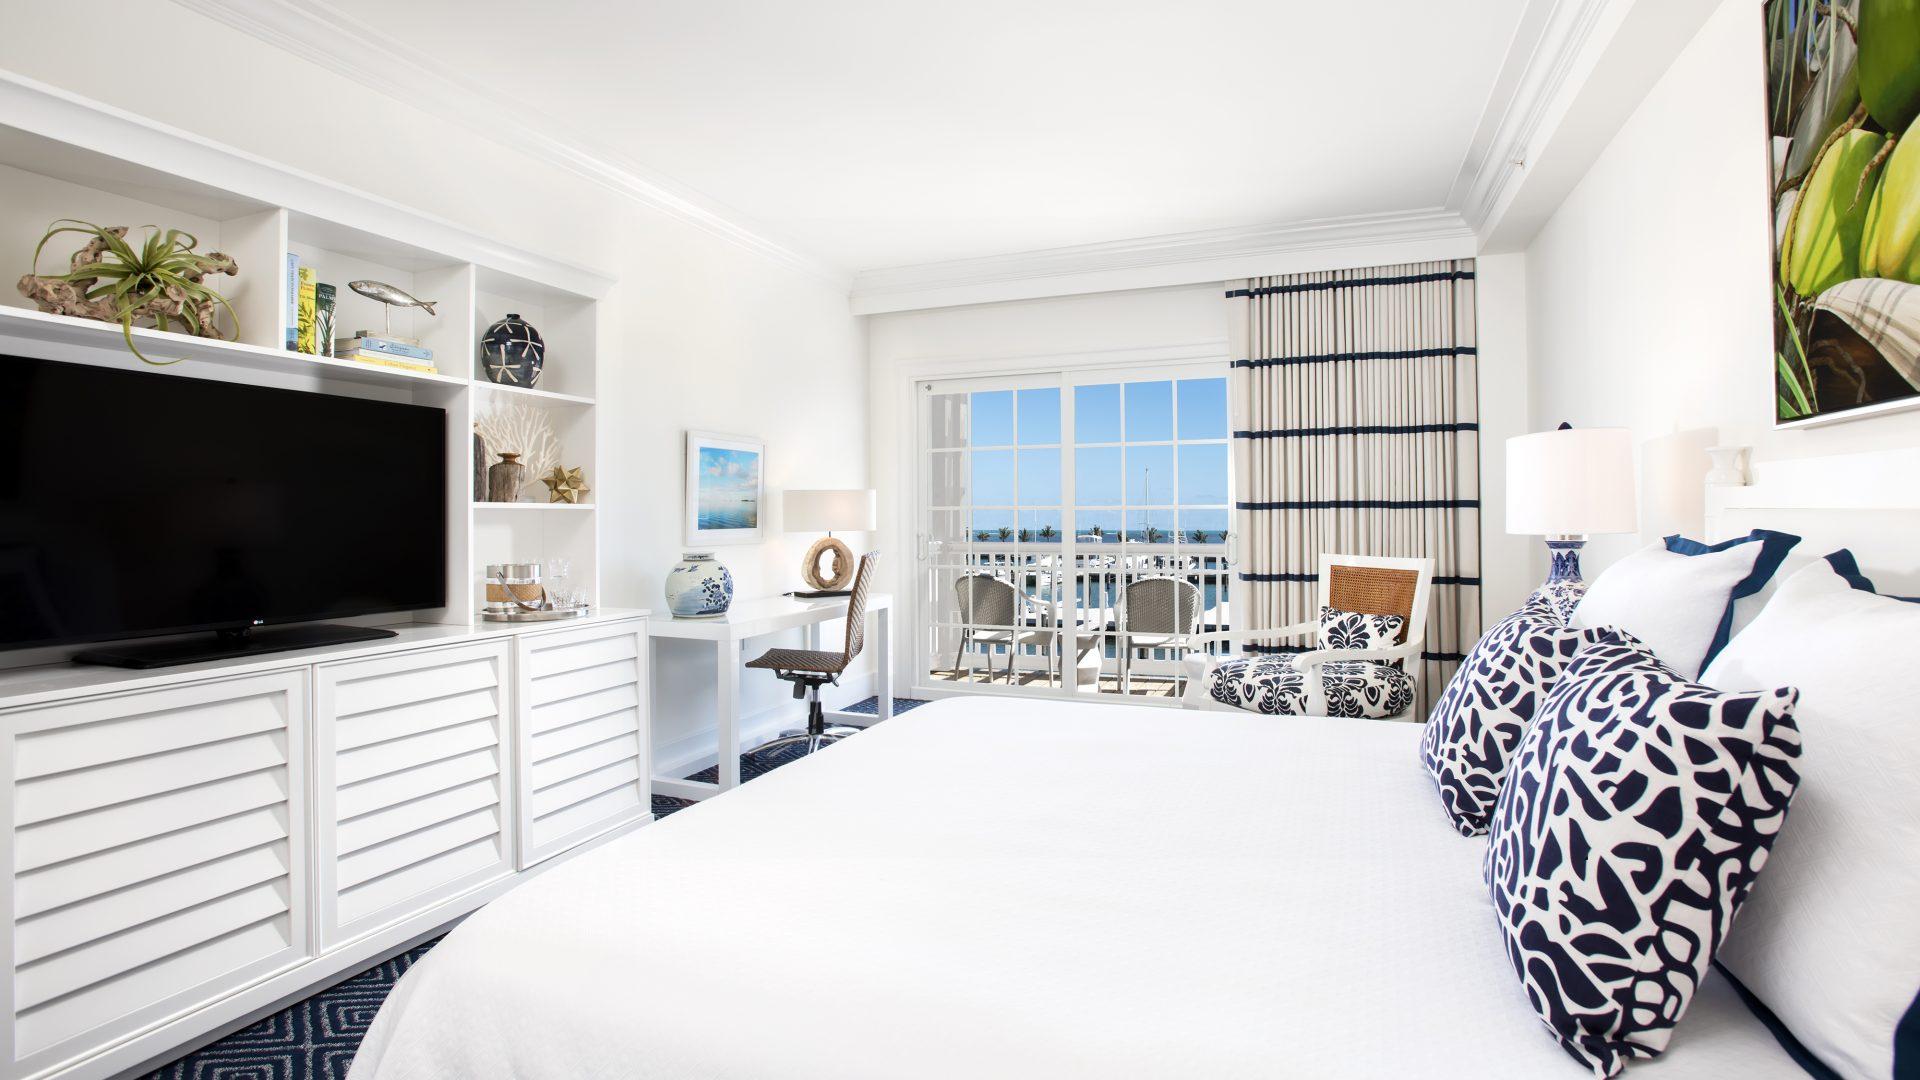 Oceans Edge Key West Resort Hotel & Marina image 0